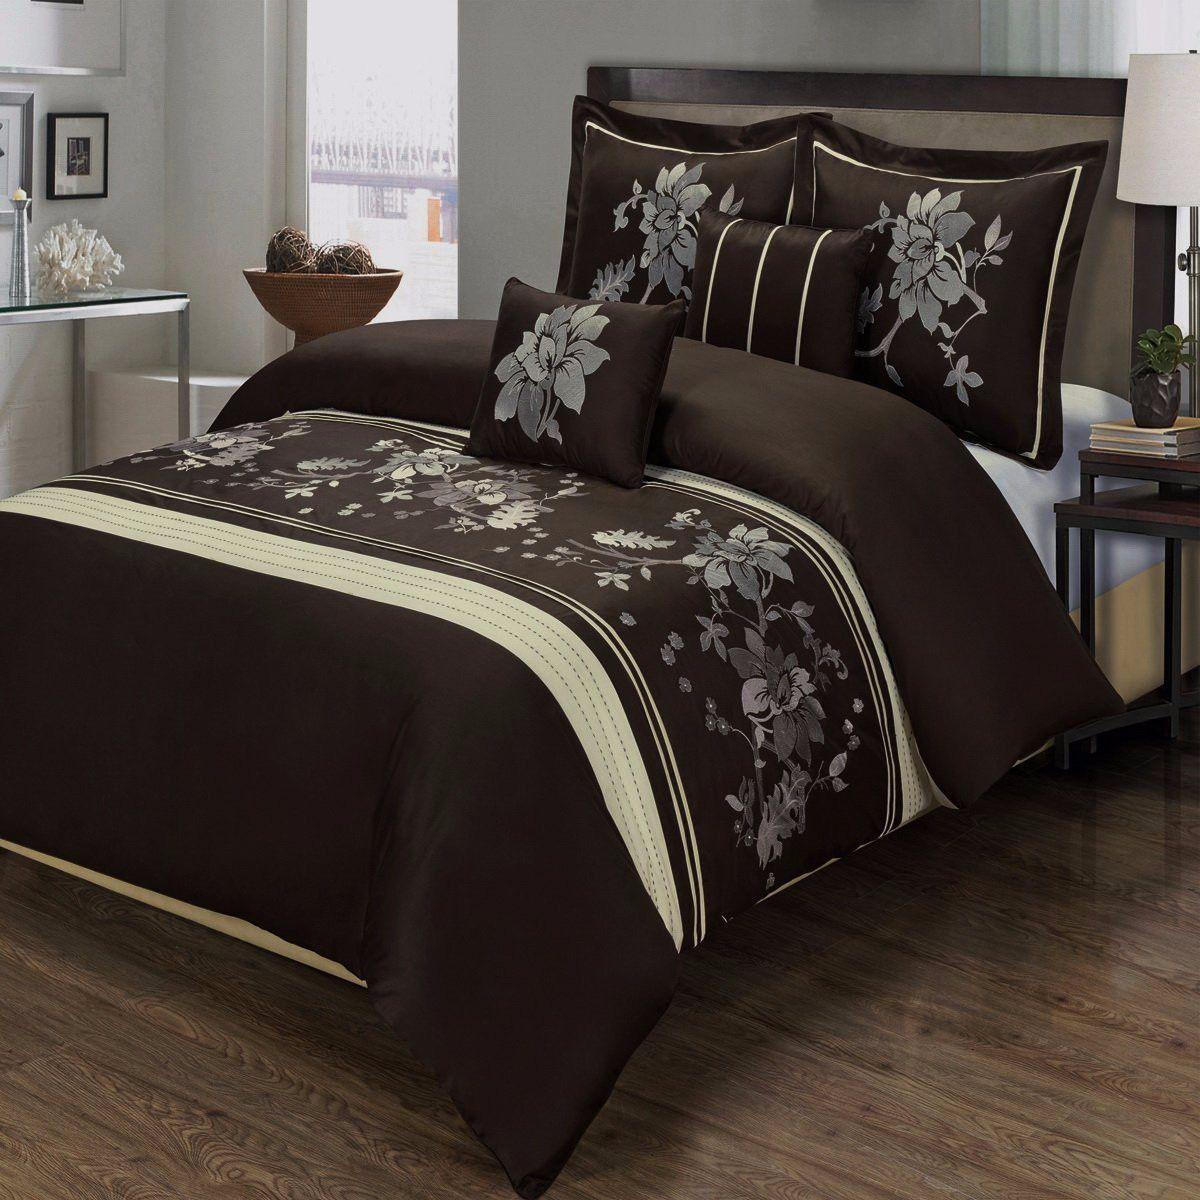 Modern Brown Cream Cotton 5pc Floral Duvet Cover Set Brown Bed